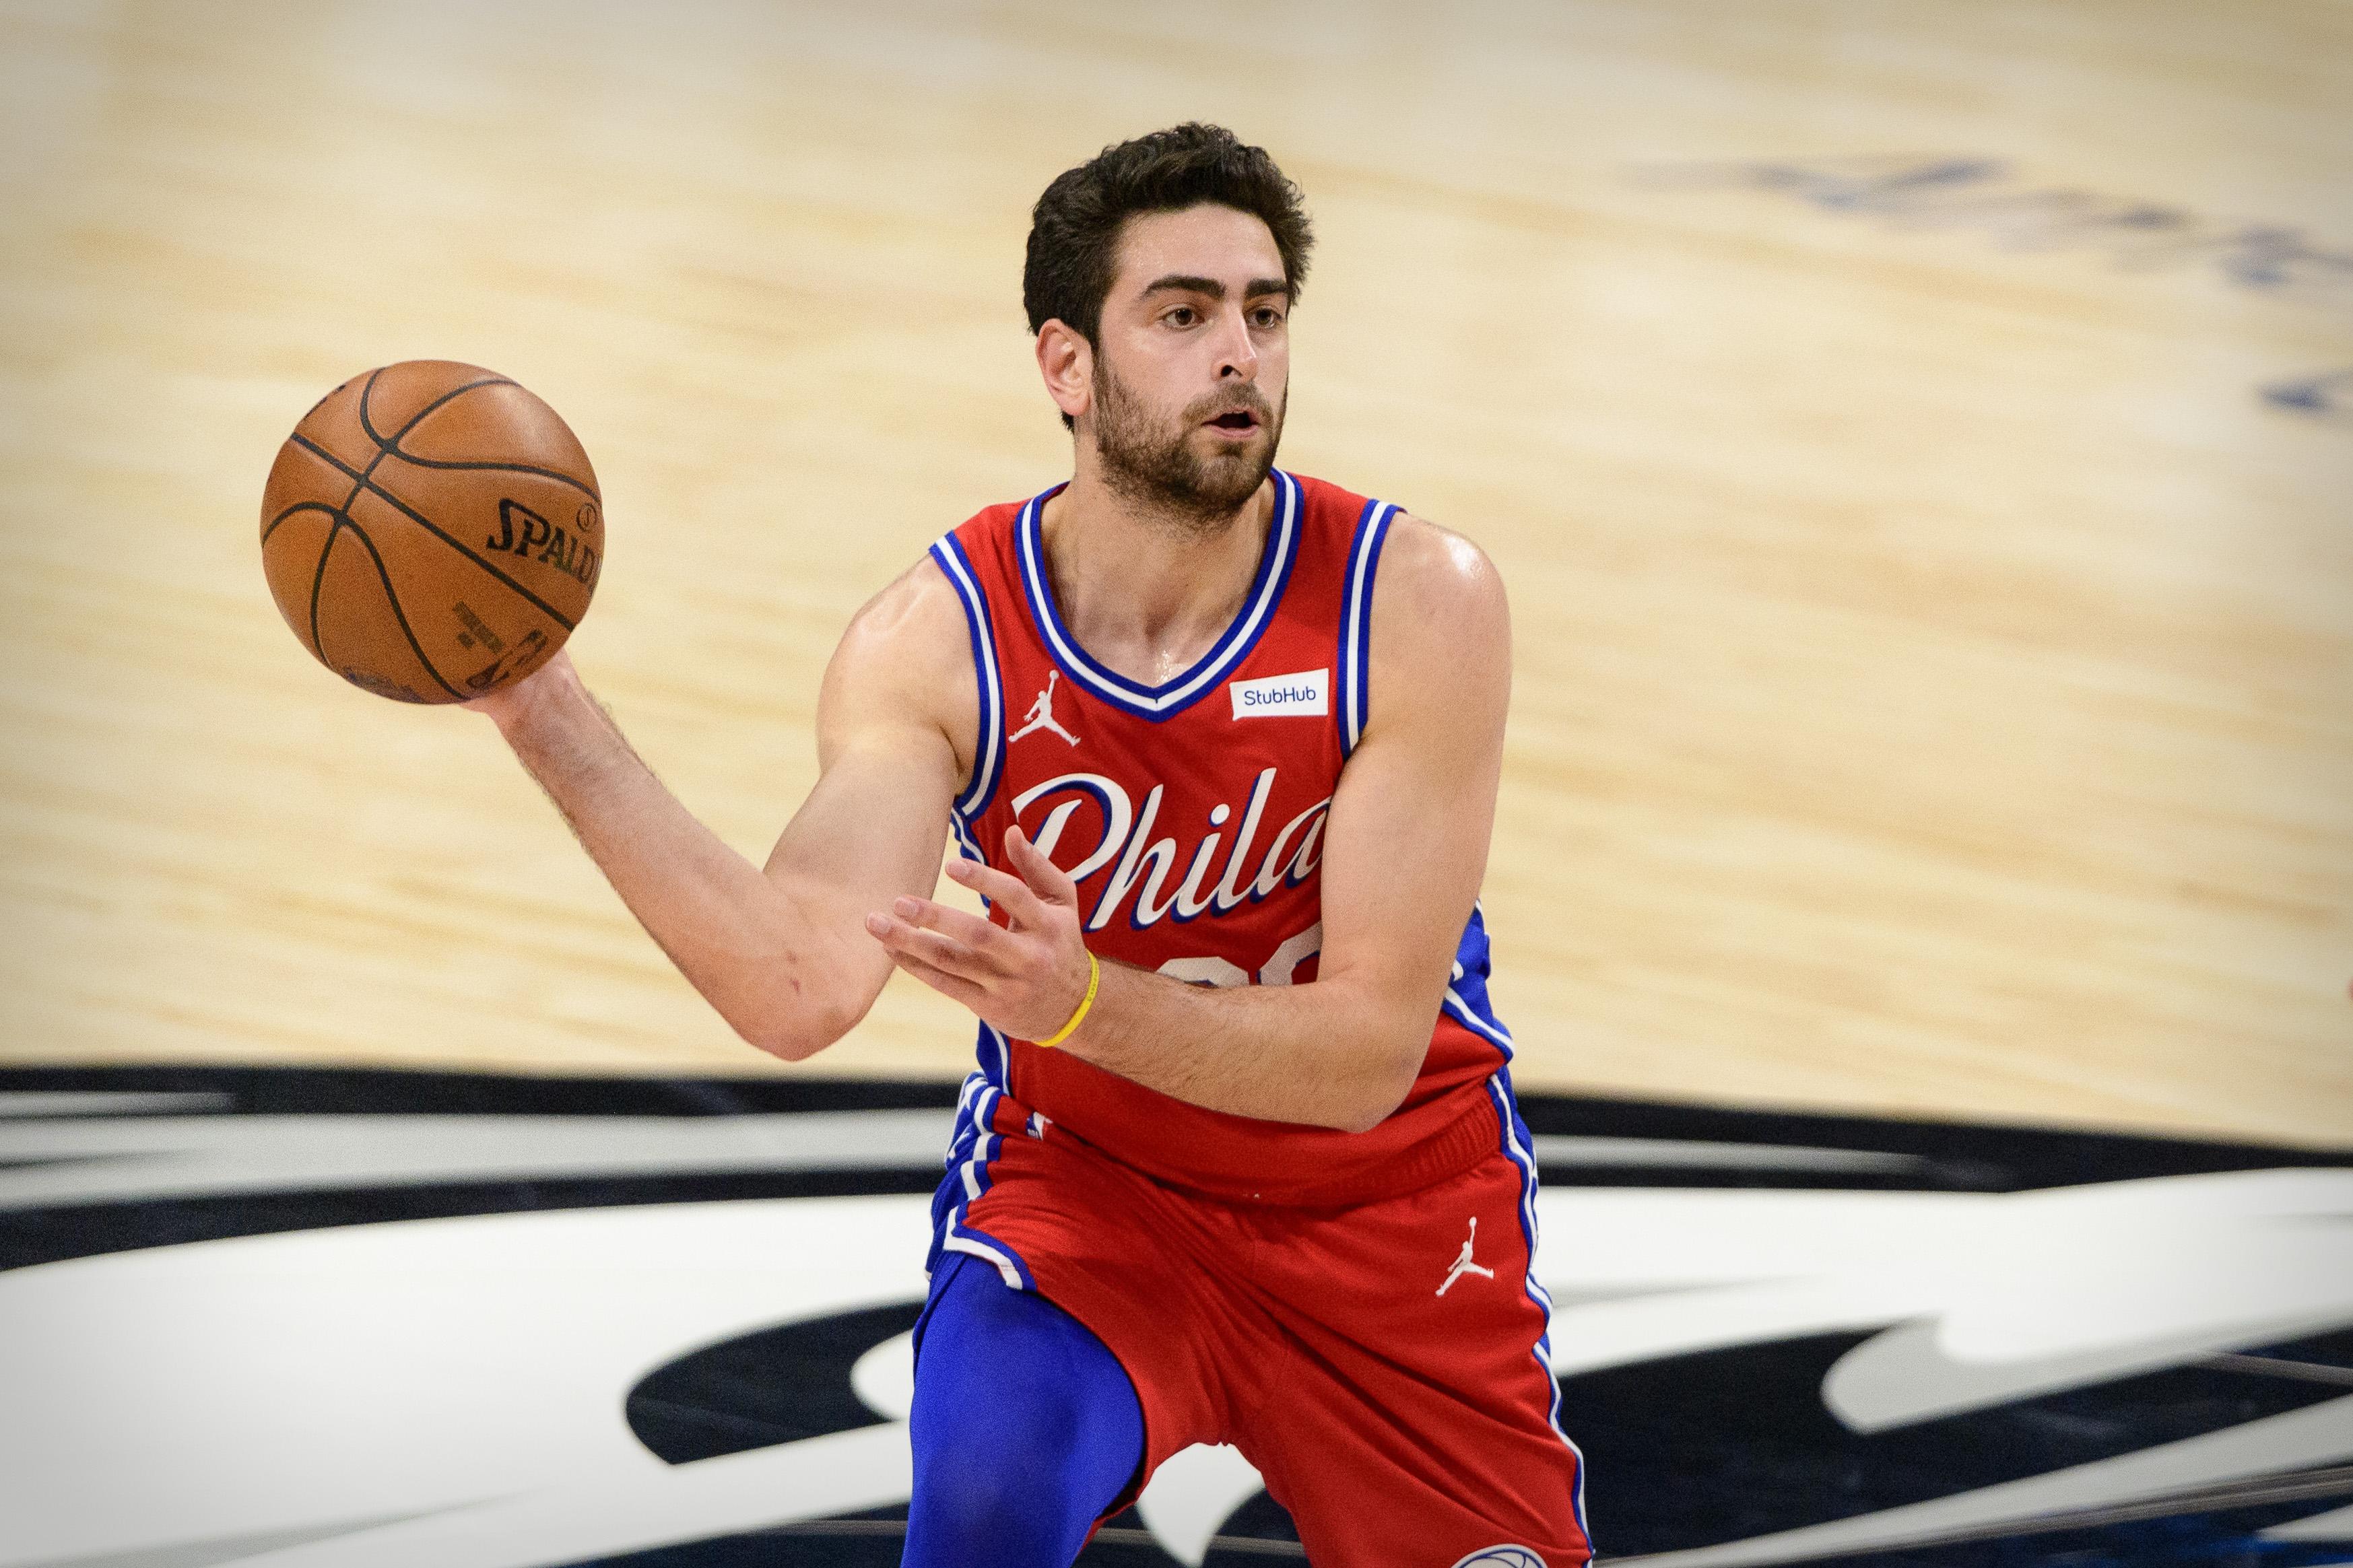 Apr 12, 2021; Dallas, Texas, USA; Philadelphia 76ers guard Furkan Korkmaz (30) passes the ball against the Dallas Mavericks during the second half at the American Airlines Center.